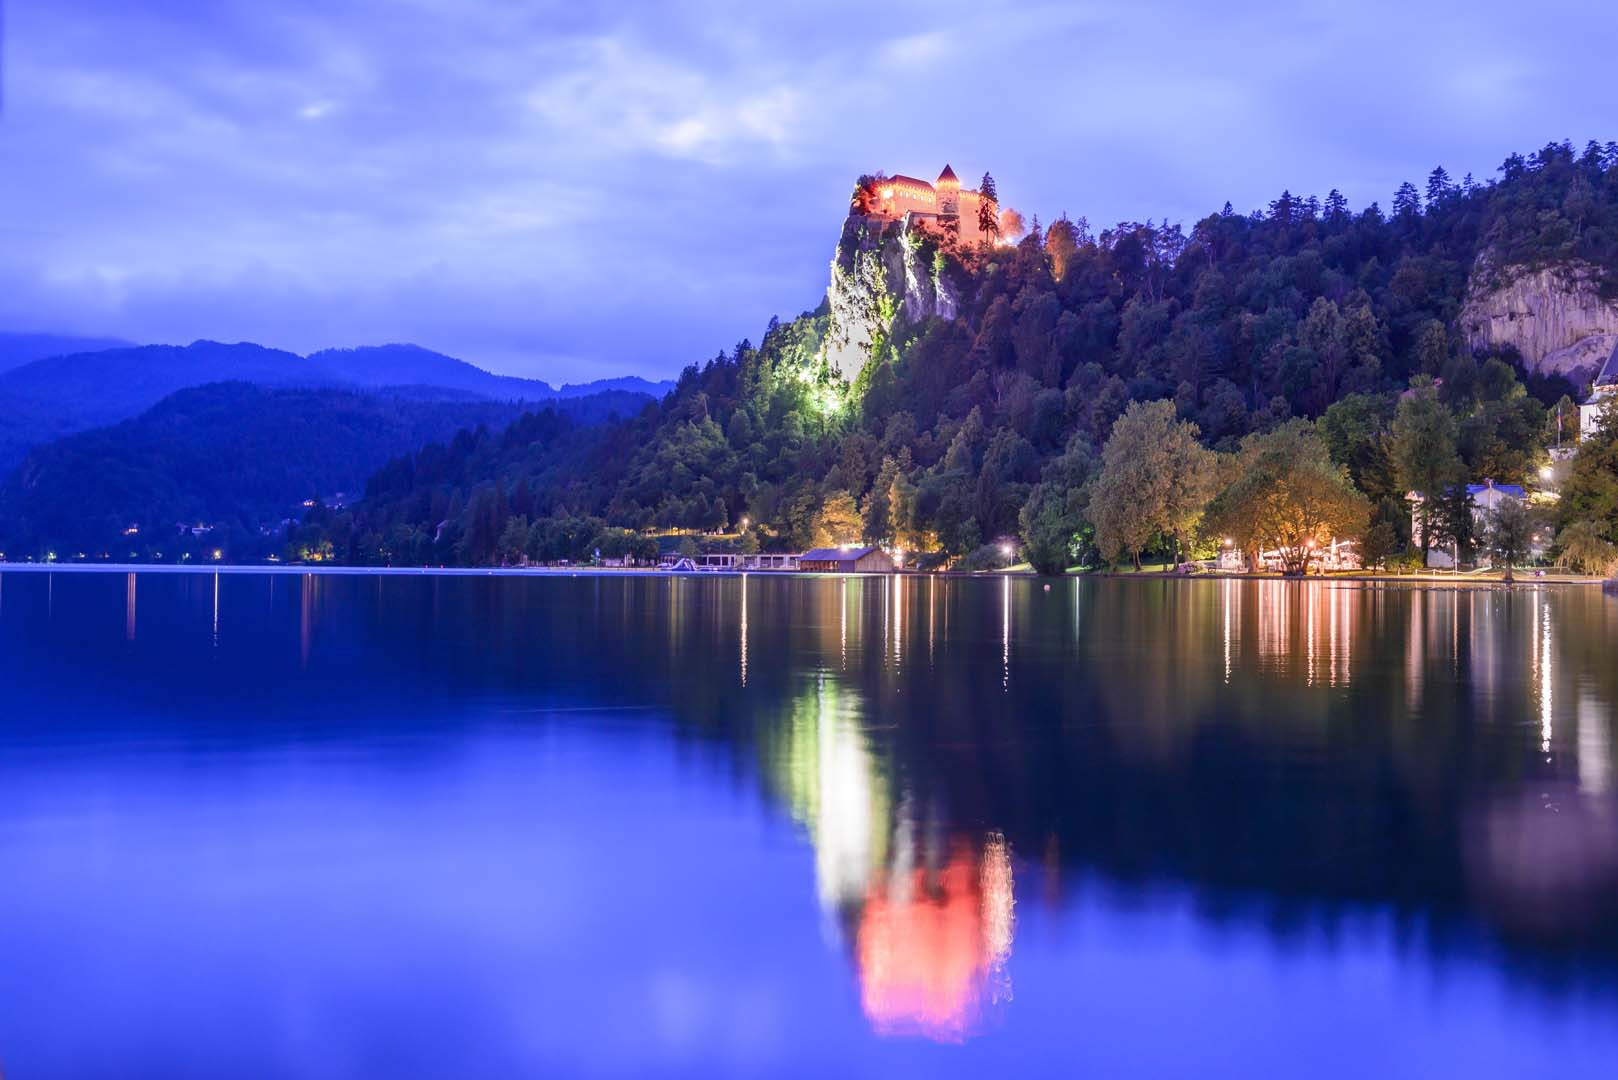 Slovenie 201907 27 HR © Peter Trimbos